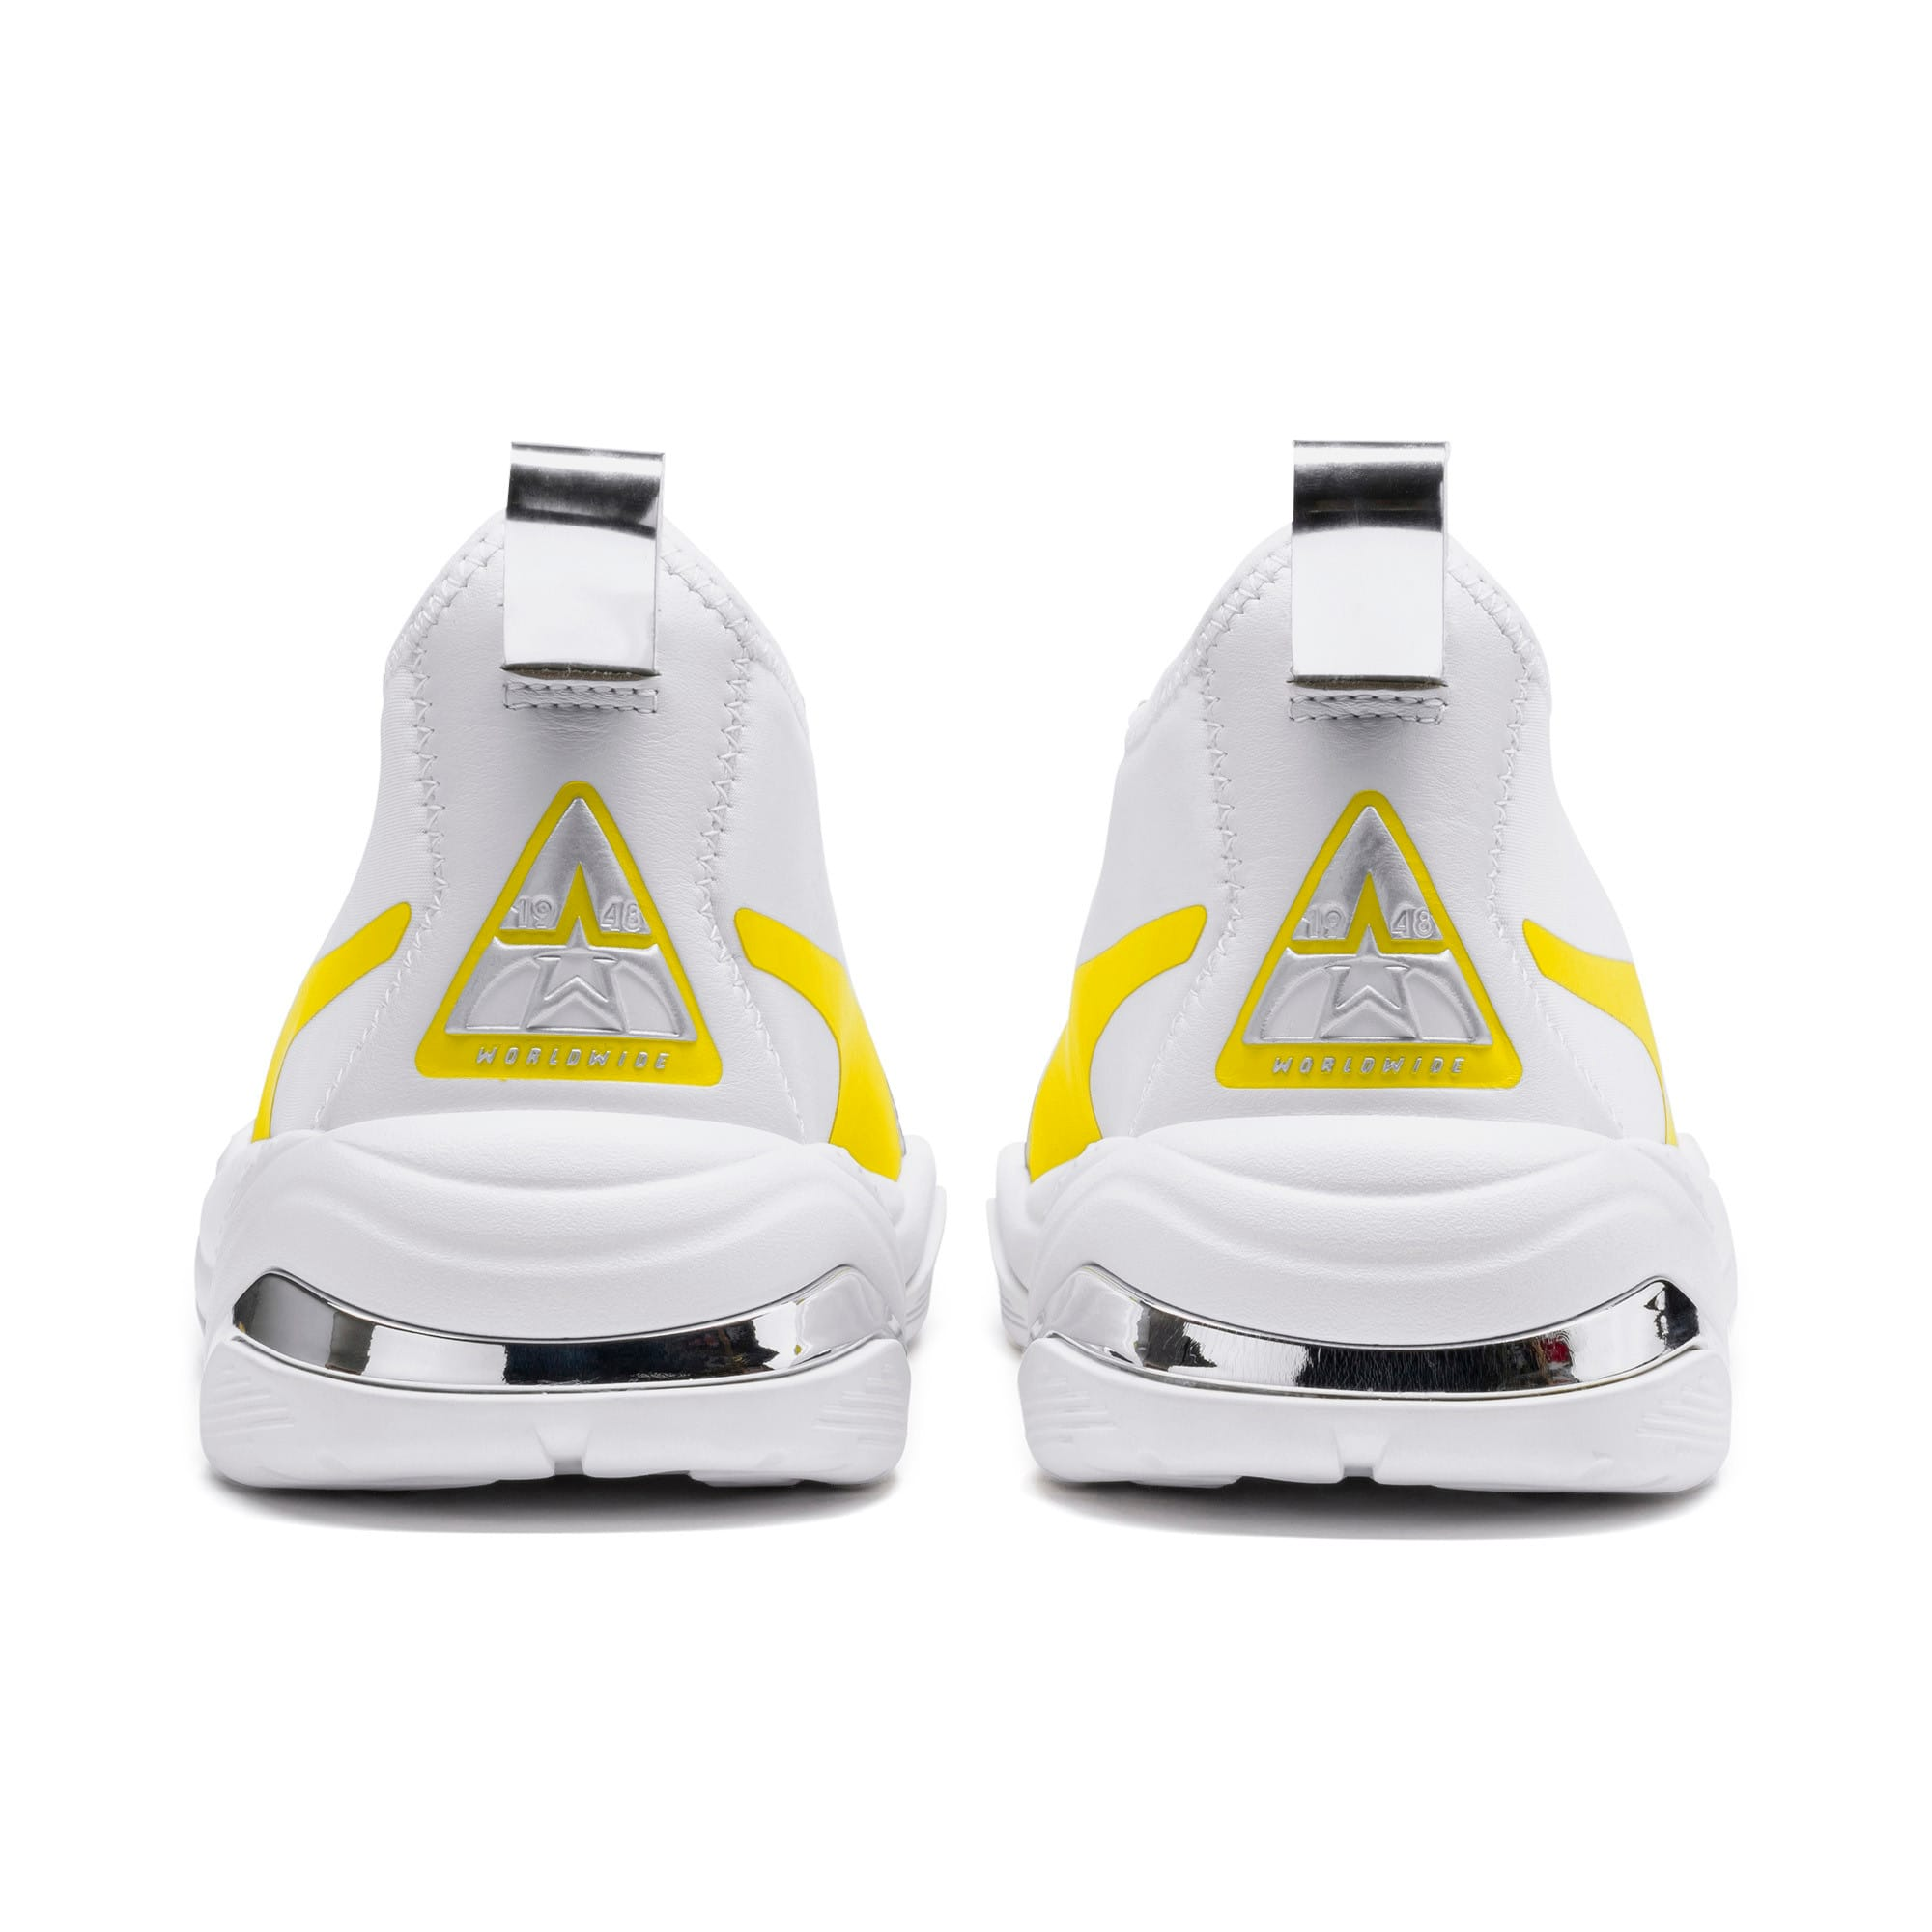 Miniatura 4 de Zapatos deportivos para mujer Thunder TrailblazerMetallic, Puma White-Blazing Yellow, mediano